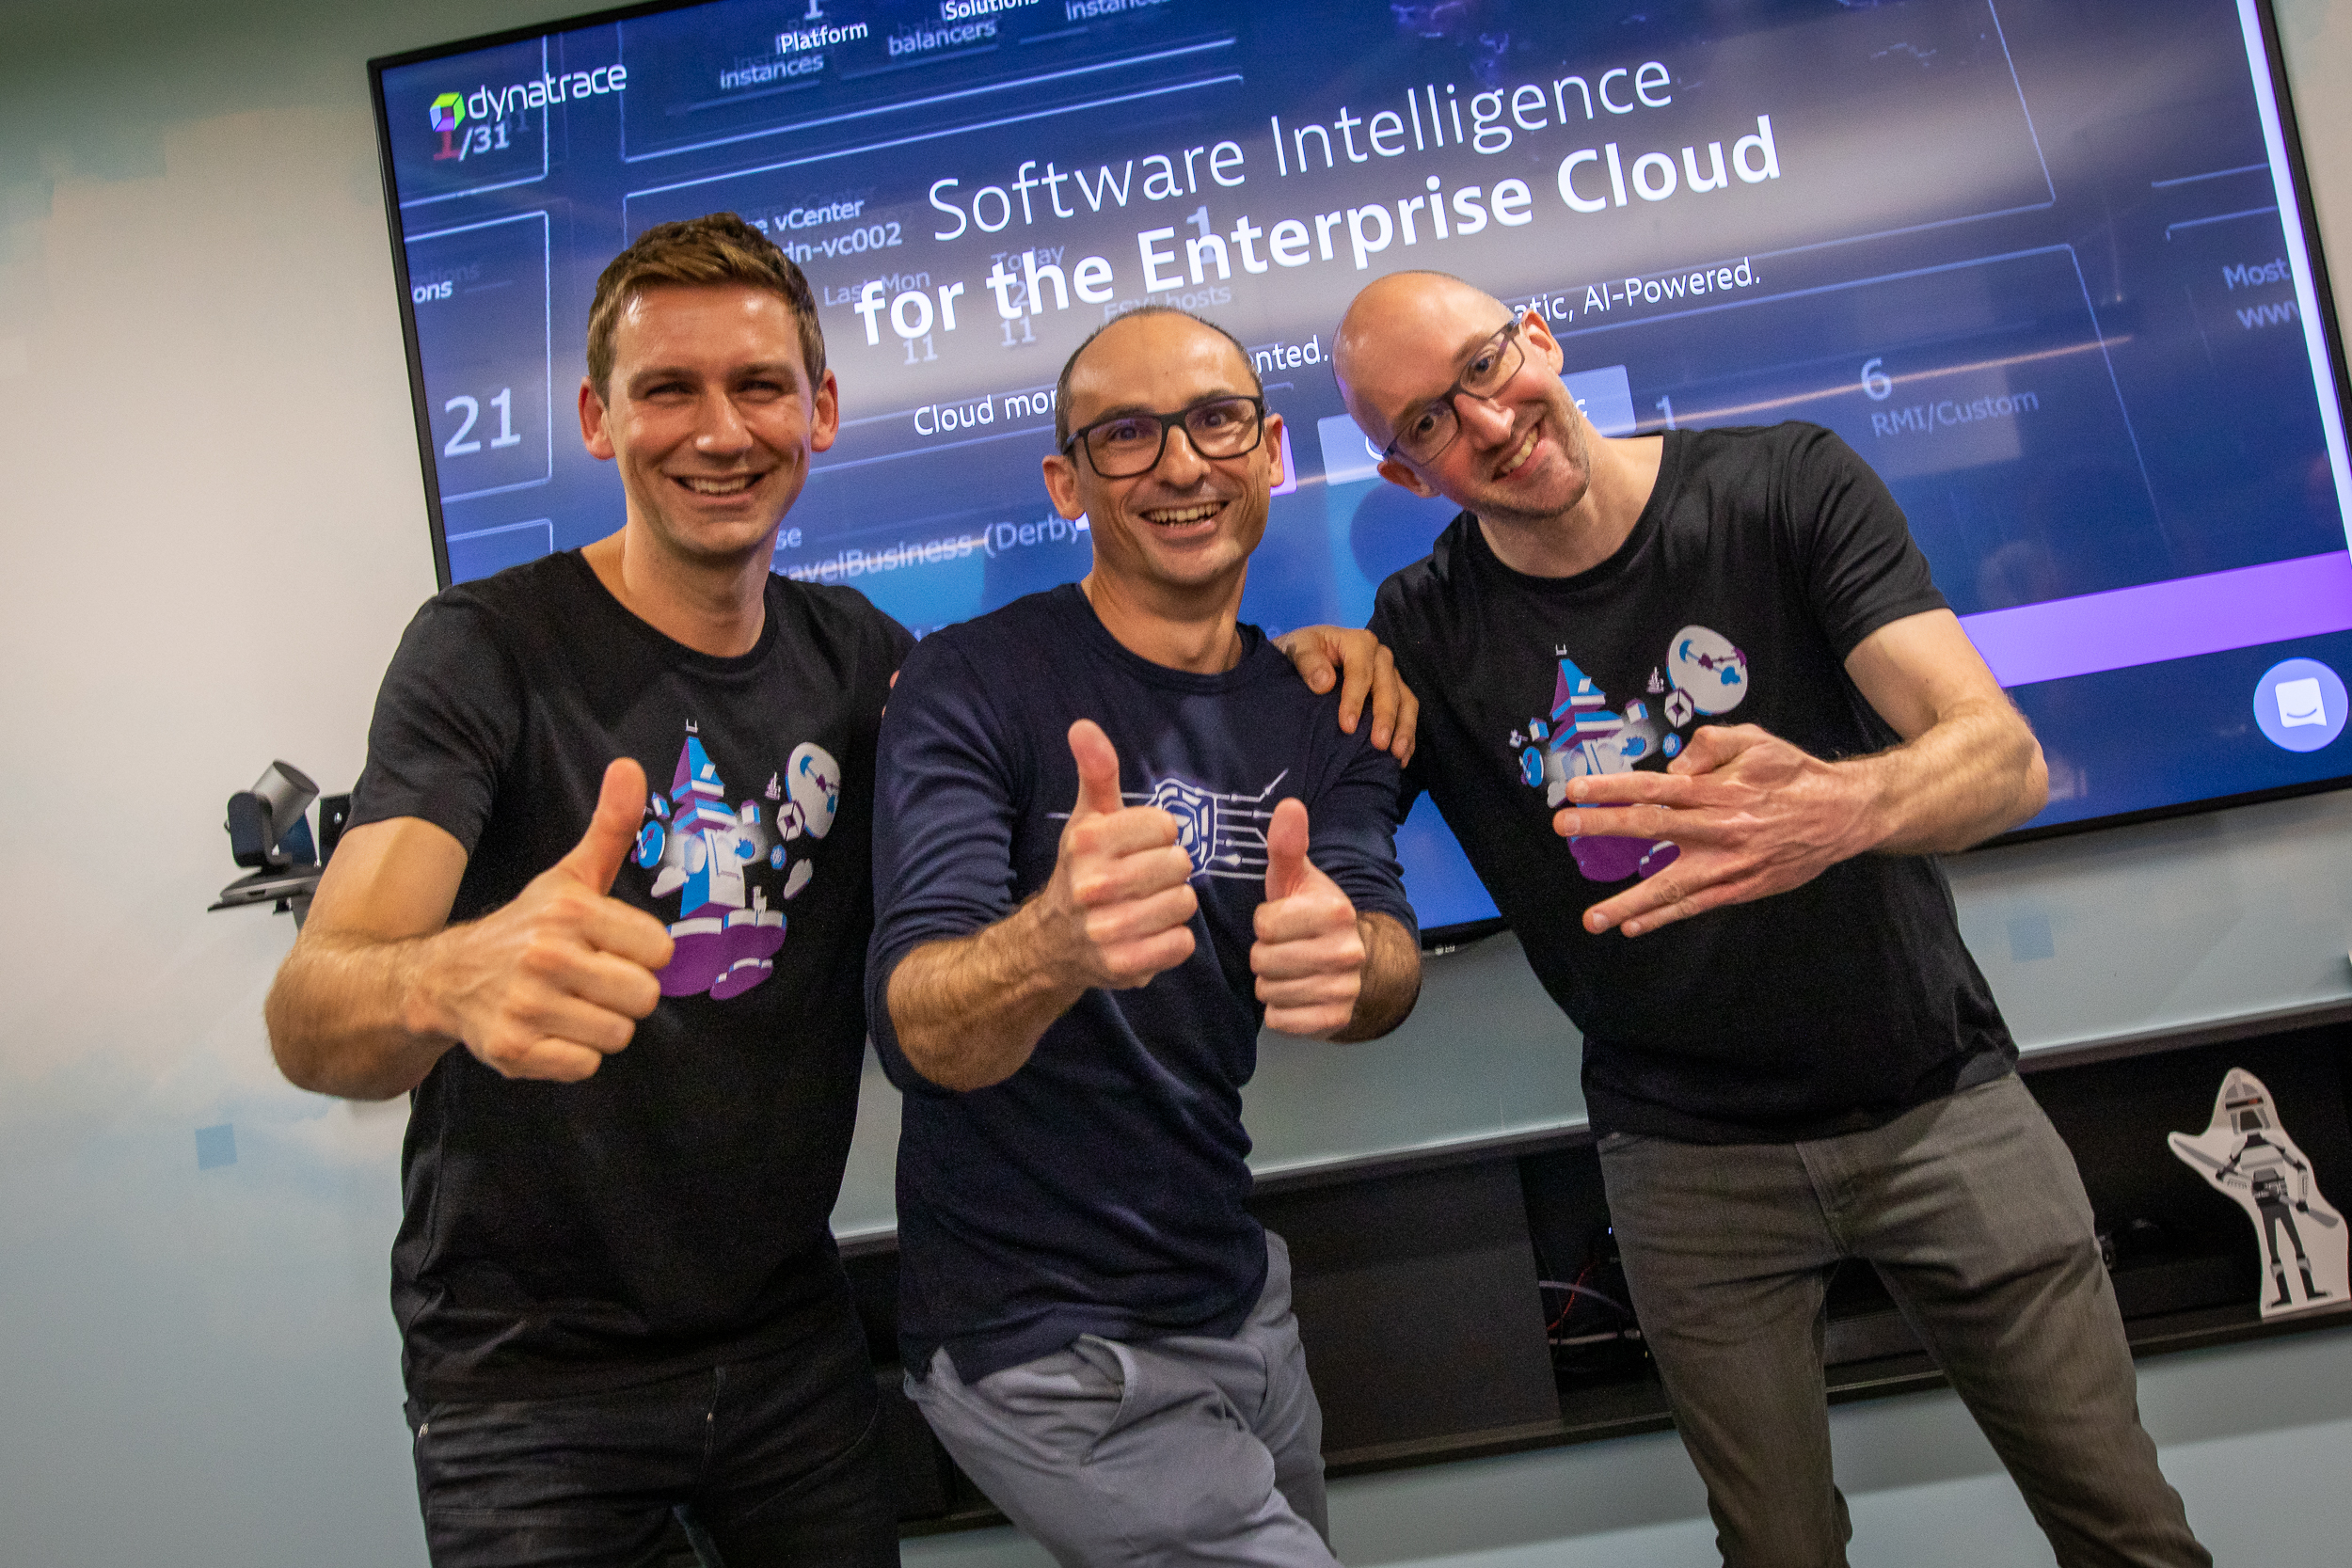 Neuer Dynatrace-Standort in Raaba bei Graz eröffnet